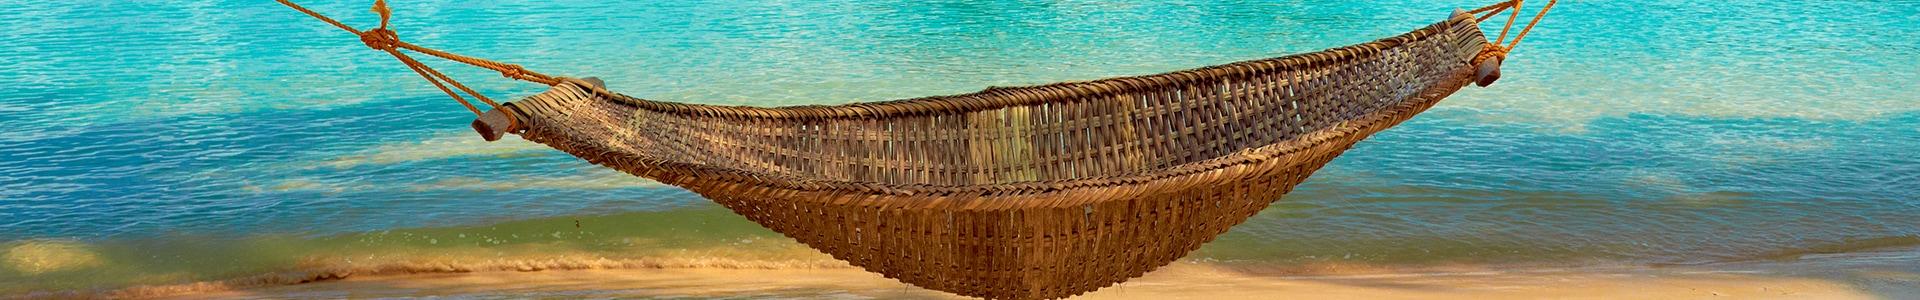 Voyages au Cap-vert